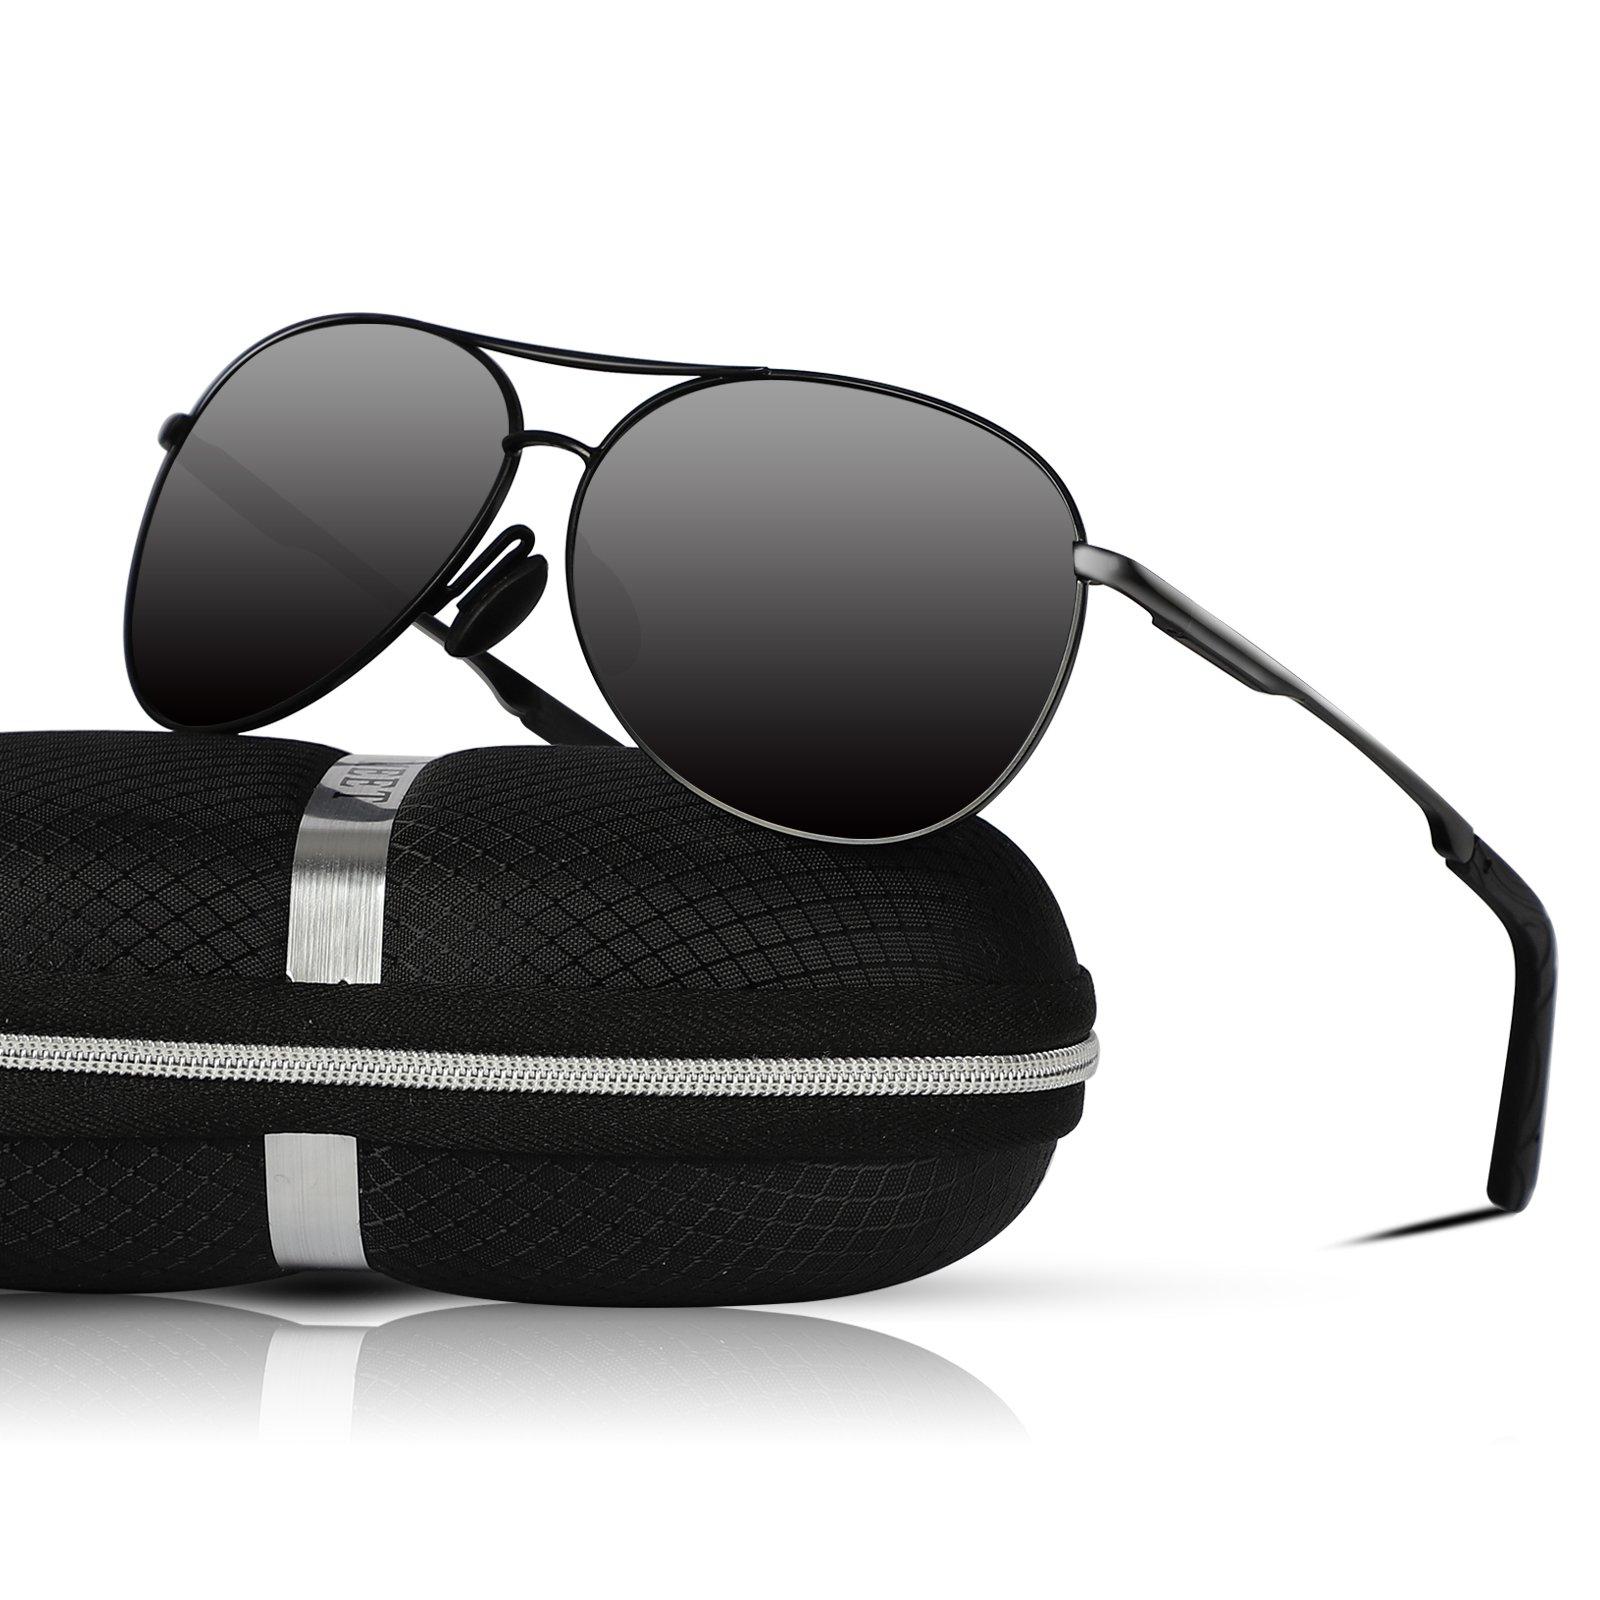 bc59de123253 ویکالا · خرید اصل اورجینال · خرید از آمازون · Polarized Aviator Sunglasses  For Men -